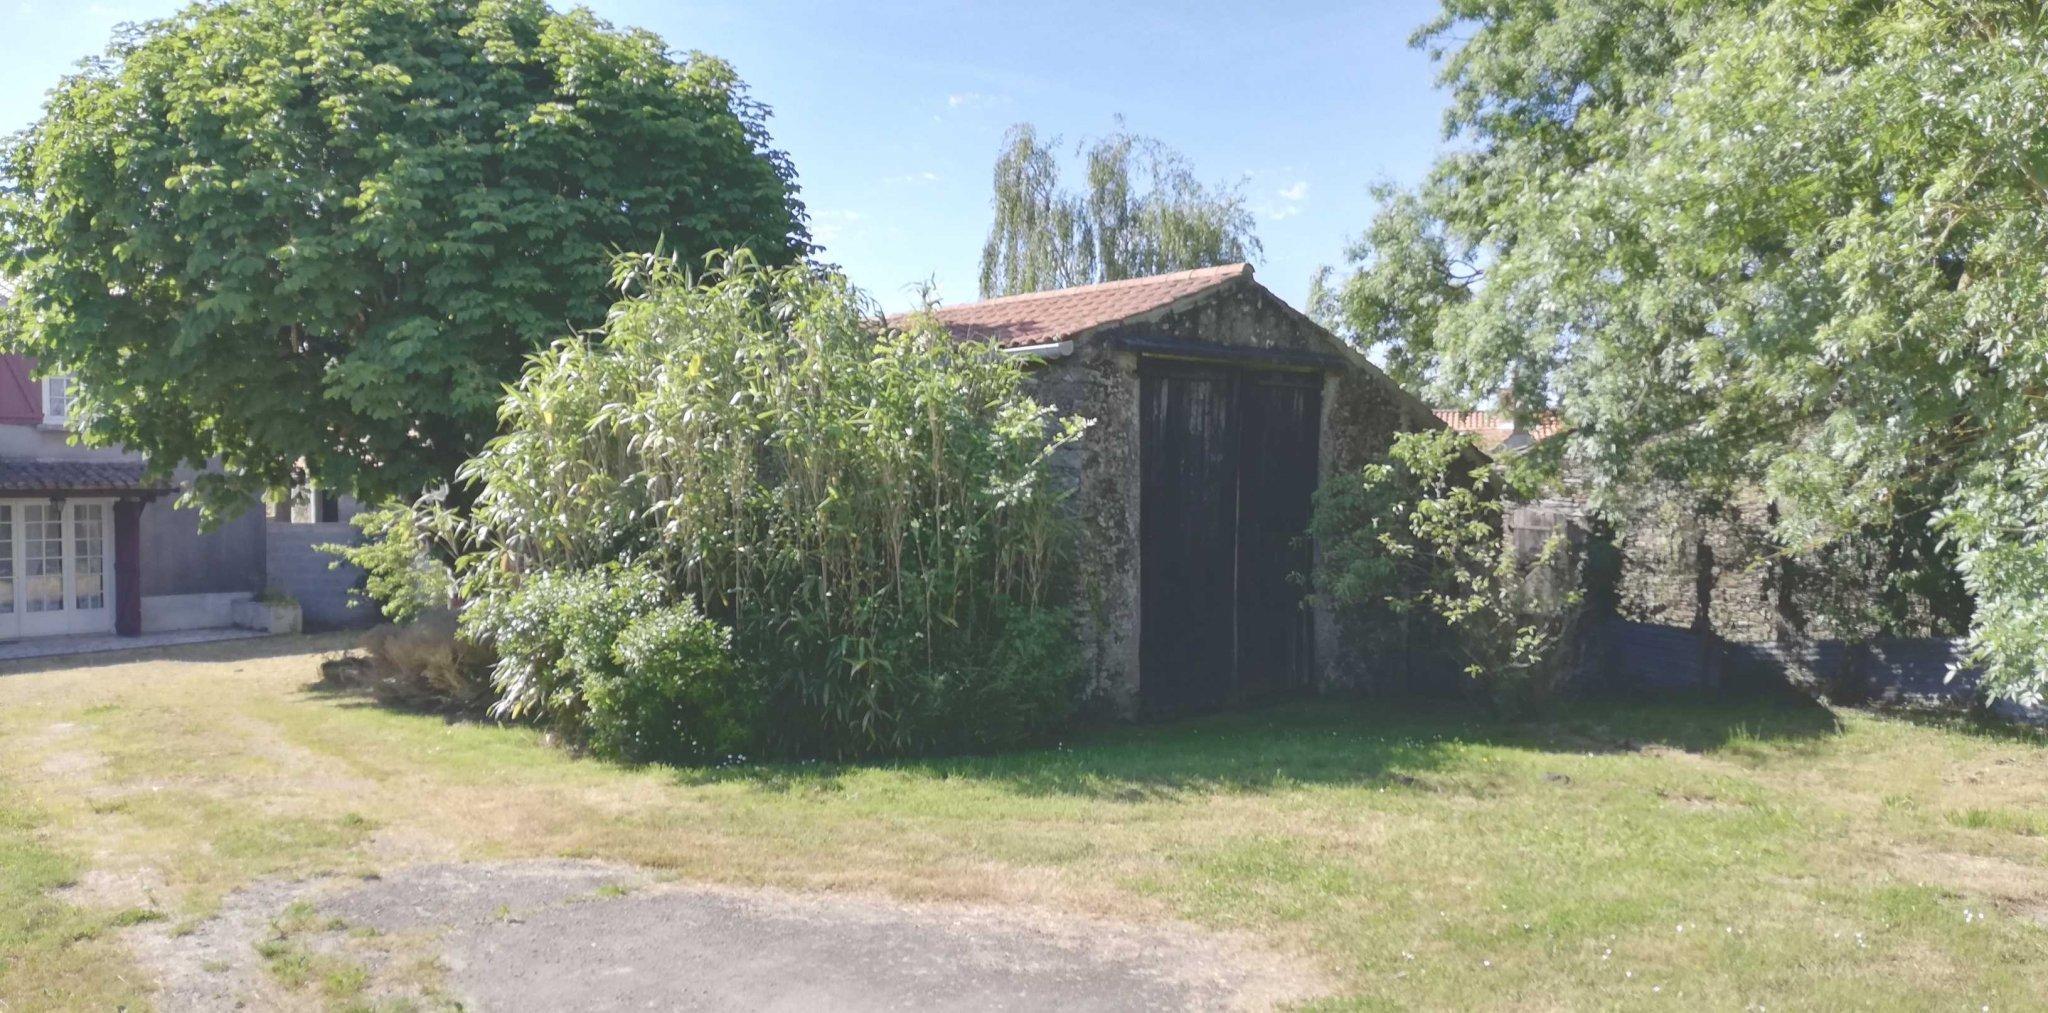 La Garnache – Grange 90 m2 environ | ref-HVMA10003451-2213